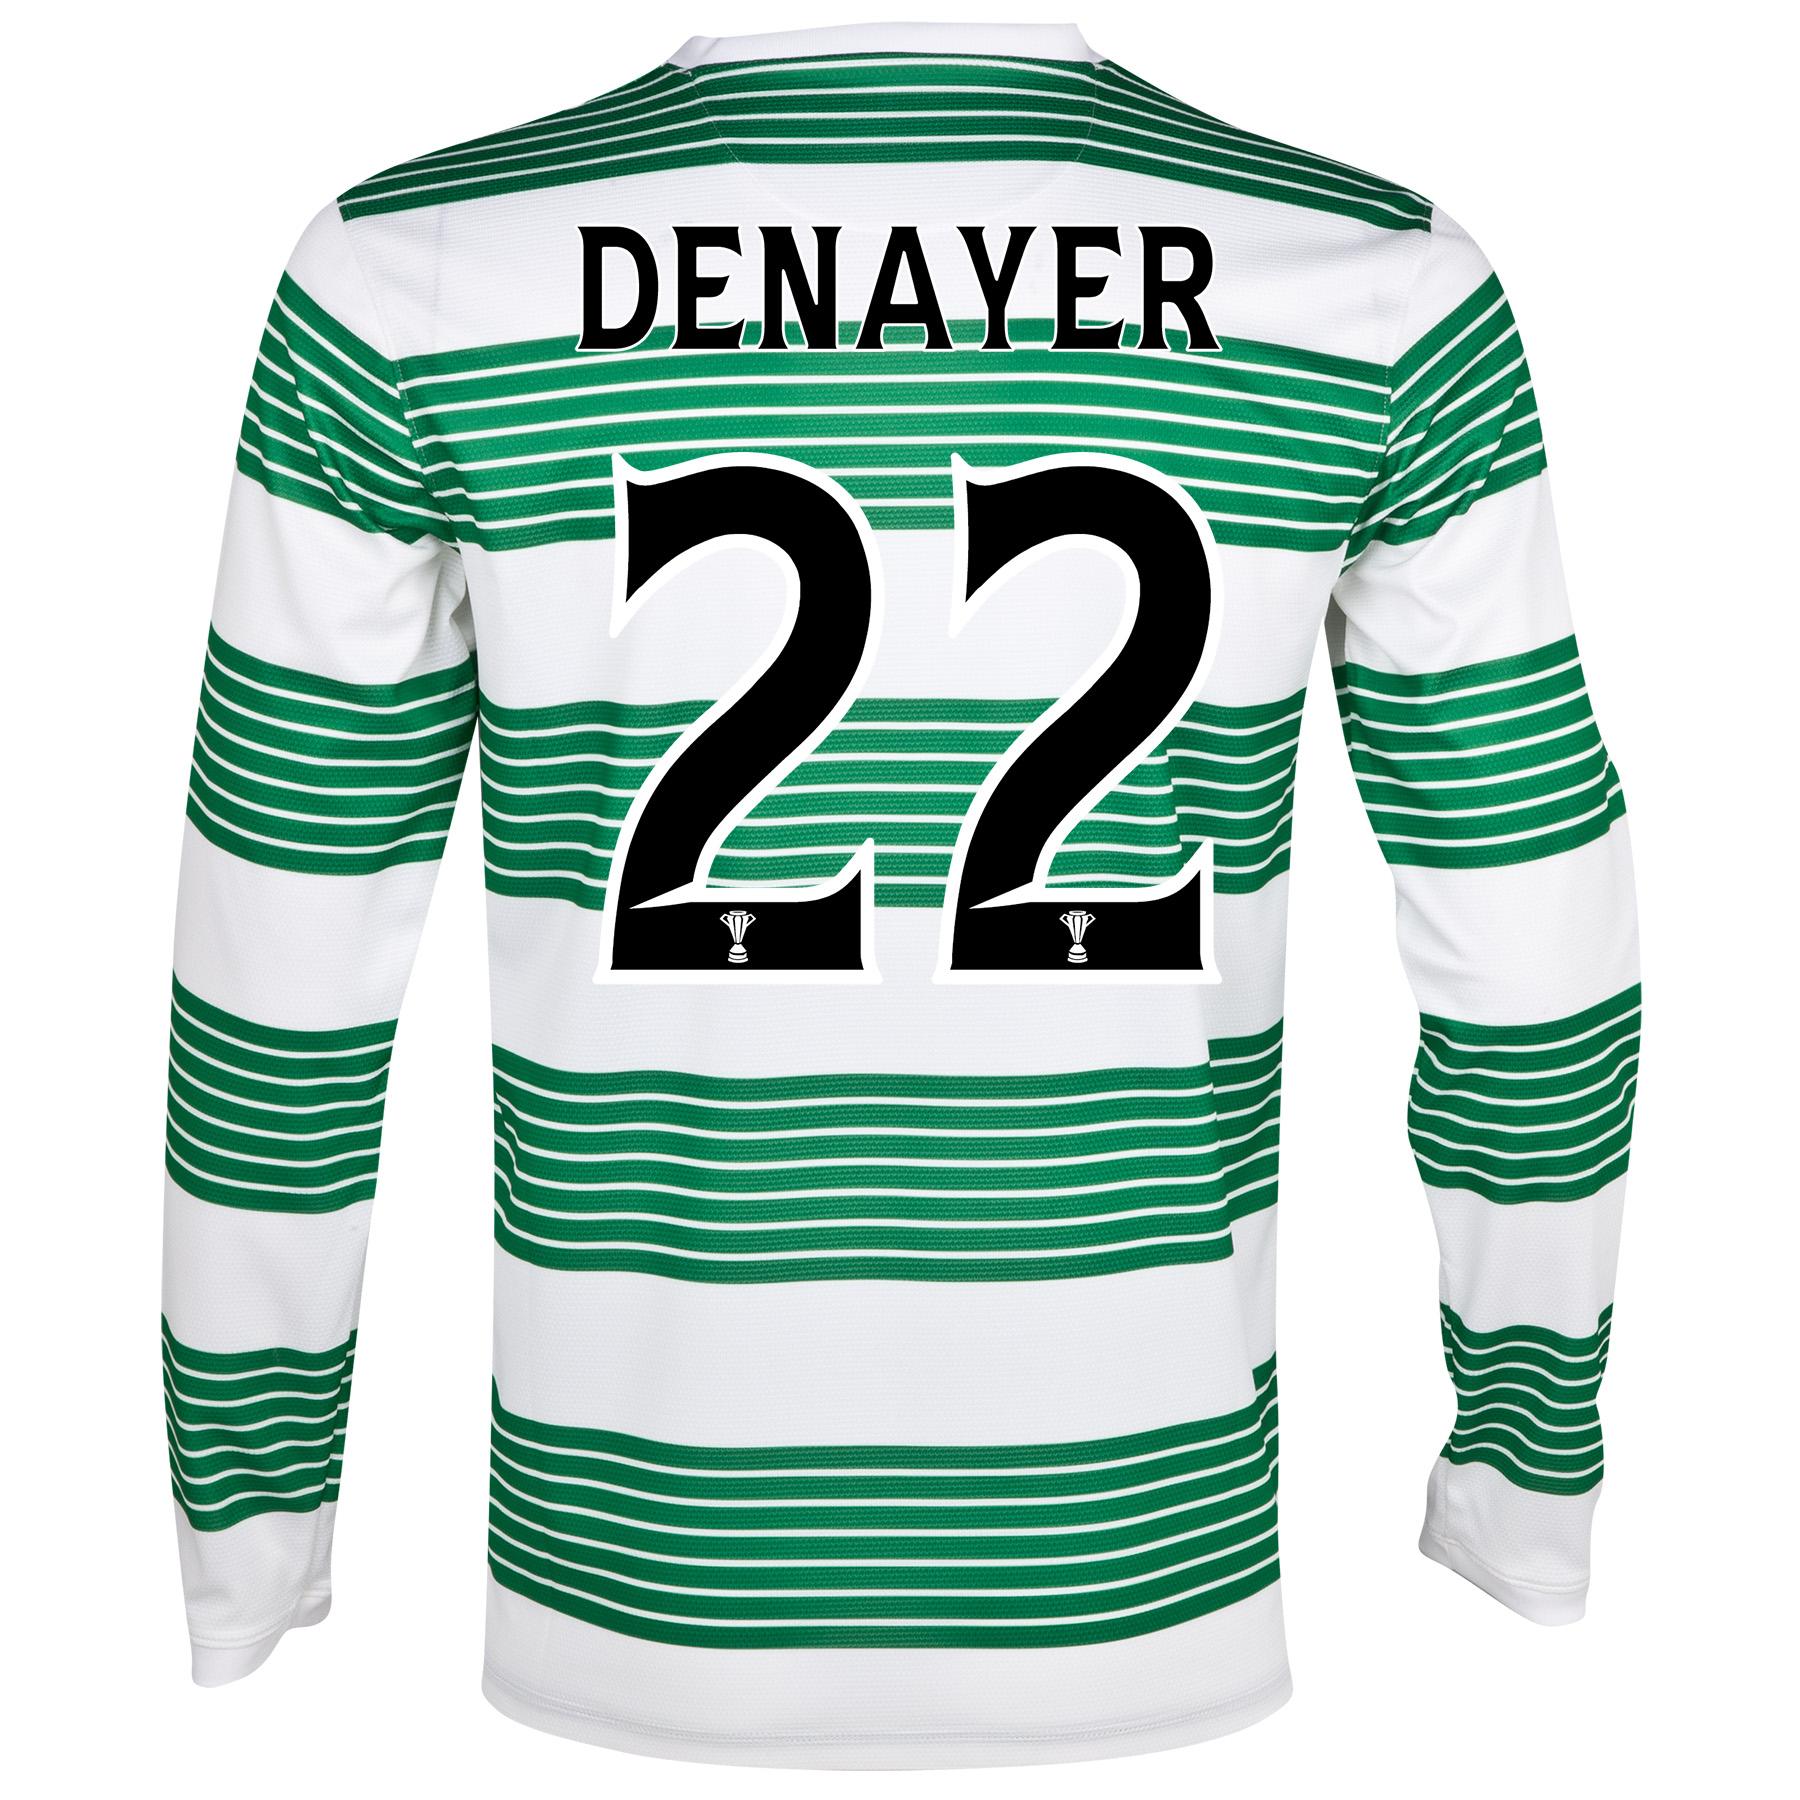 Celtic Home Shirt 2013/15 - L/S- Unsponsored with Denayer 22 printing